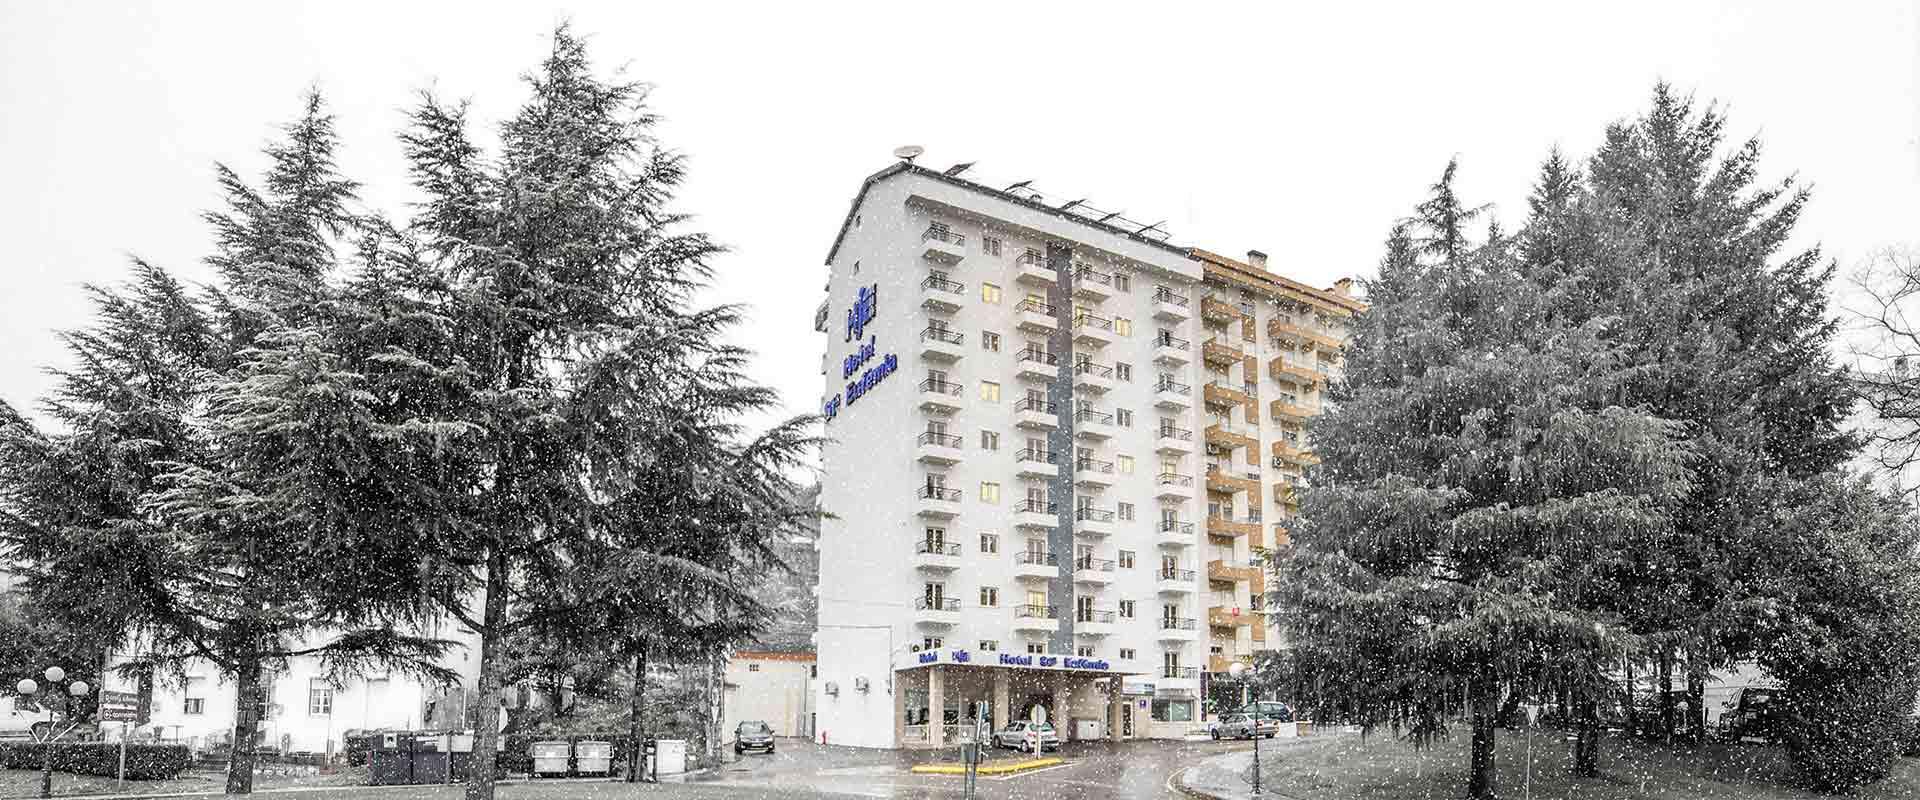 SantaEufemia-RMPZ-Group.jpg